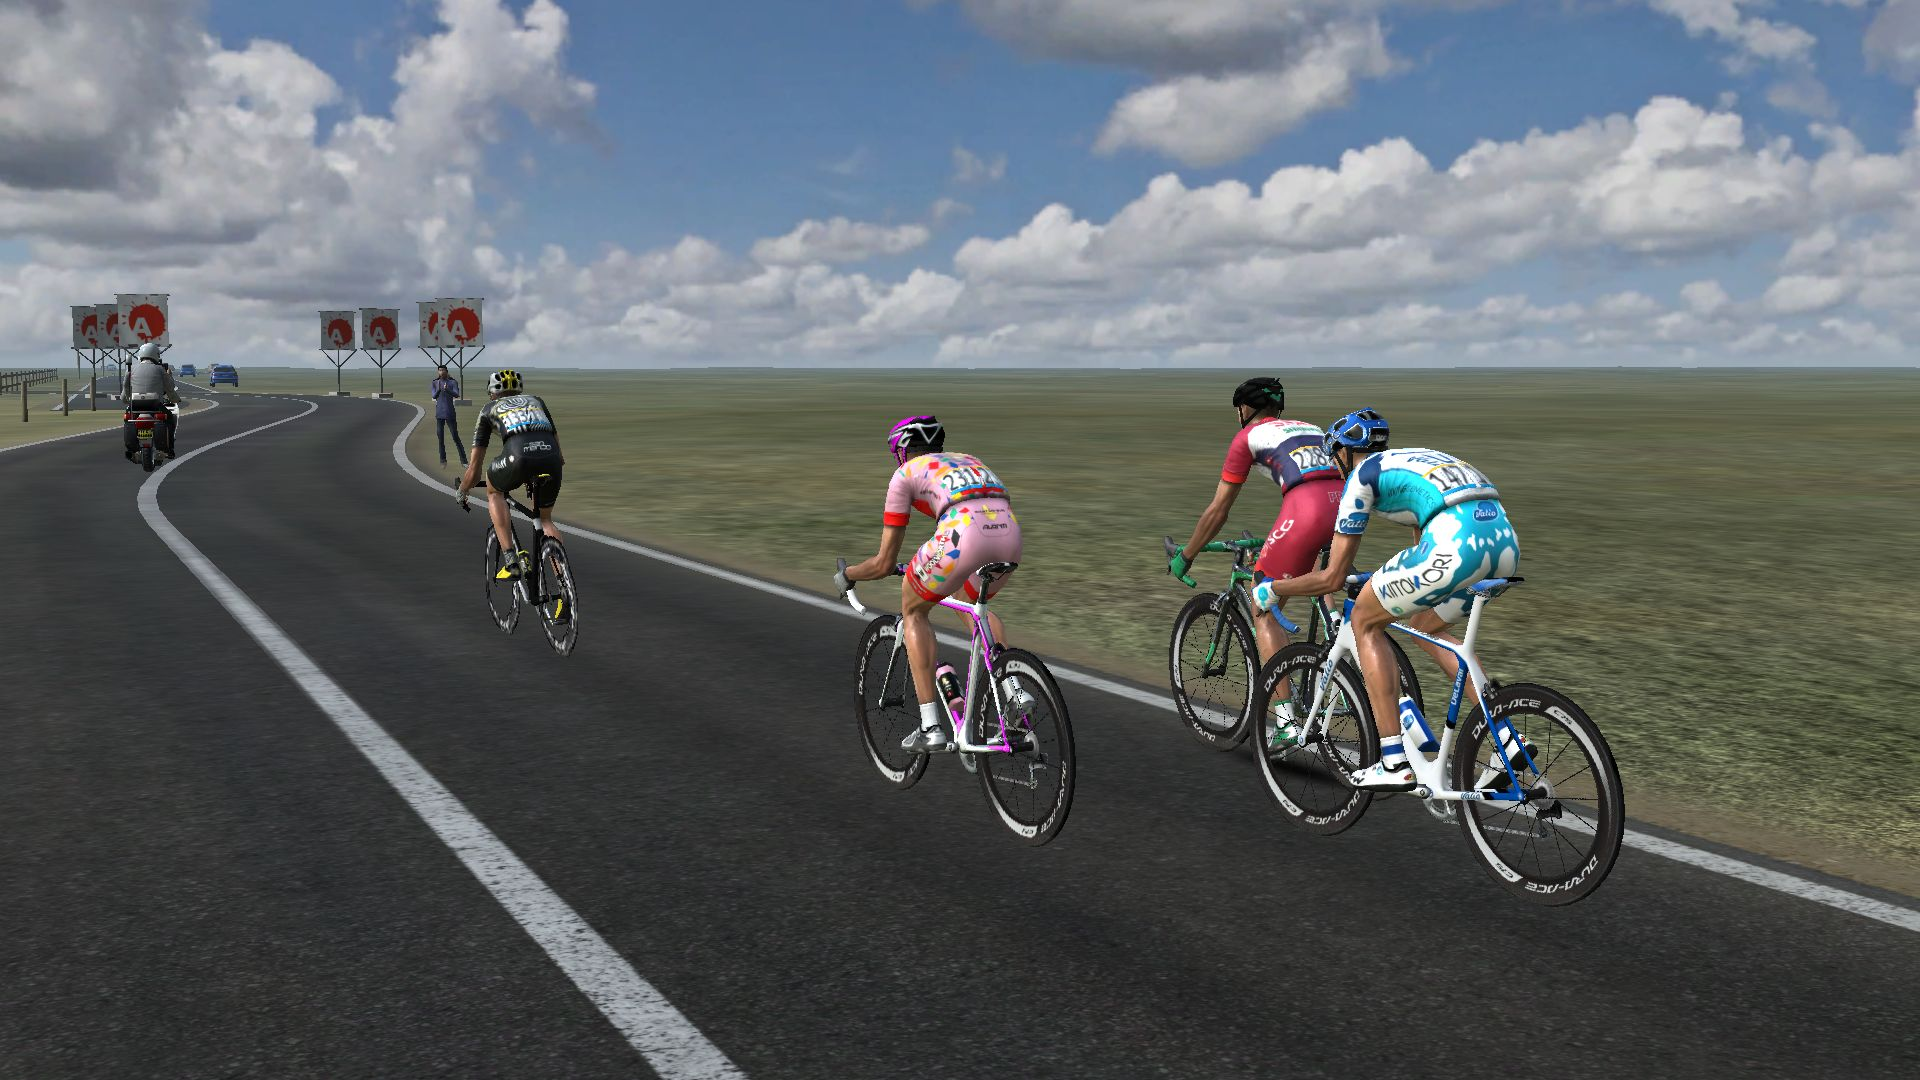 pcmdaily.com/images/mg/2019/Races/GTM/Giro/mg19_giro_18_PCM0251.jpg